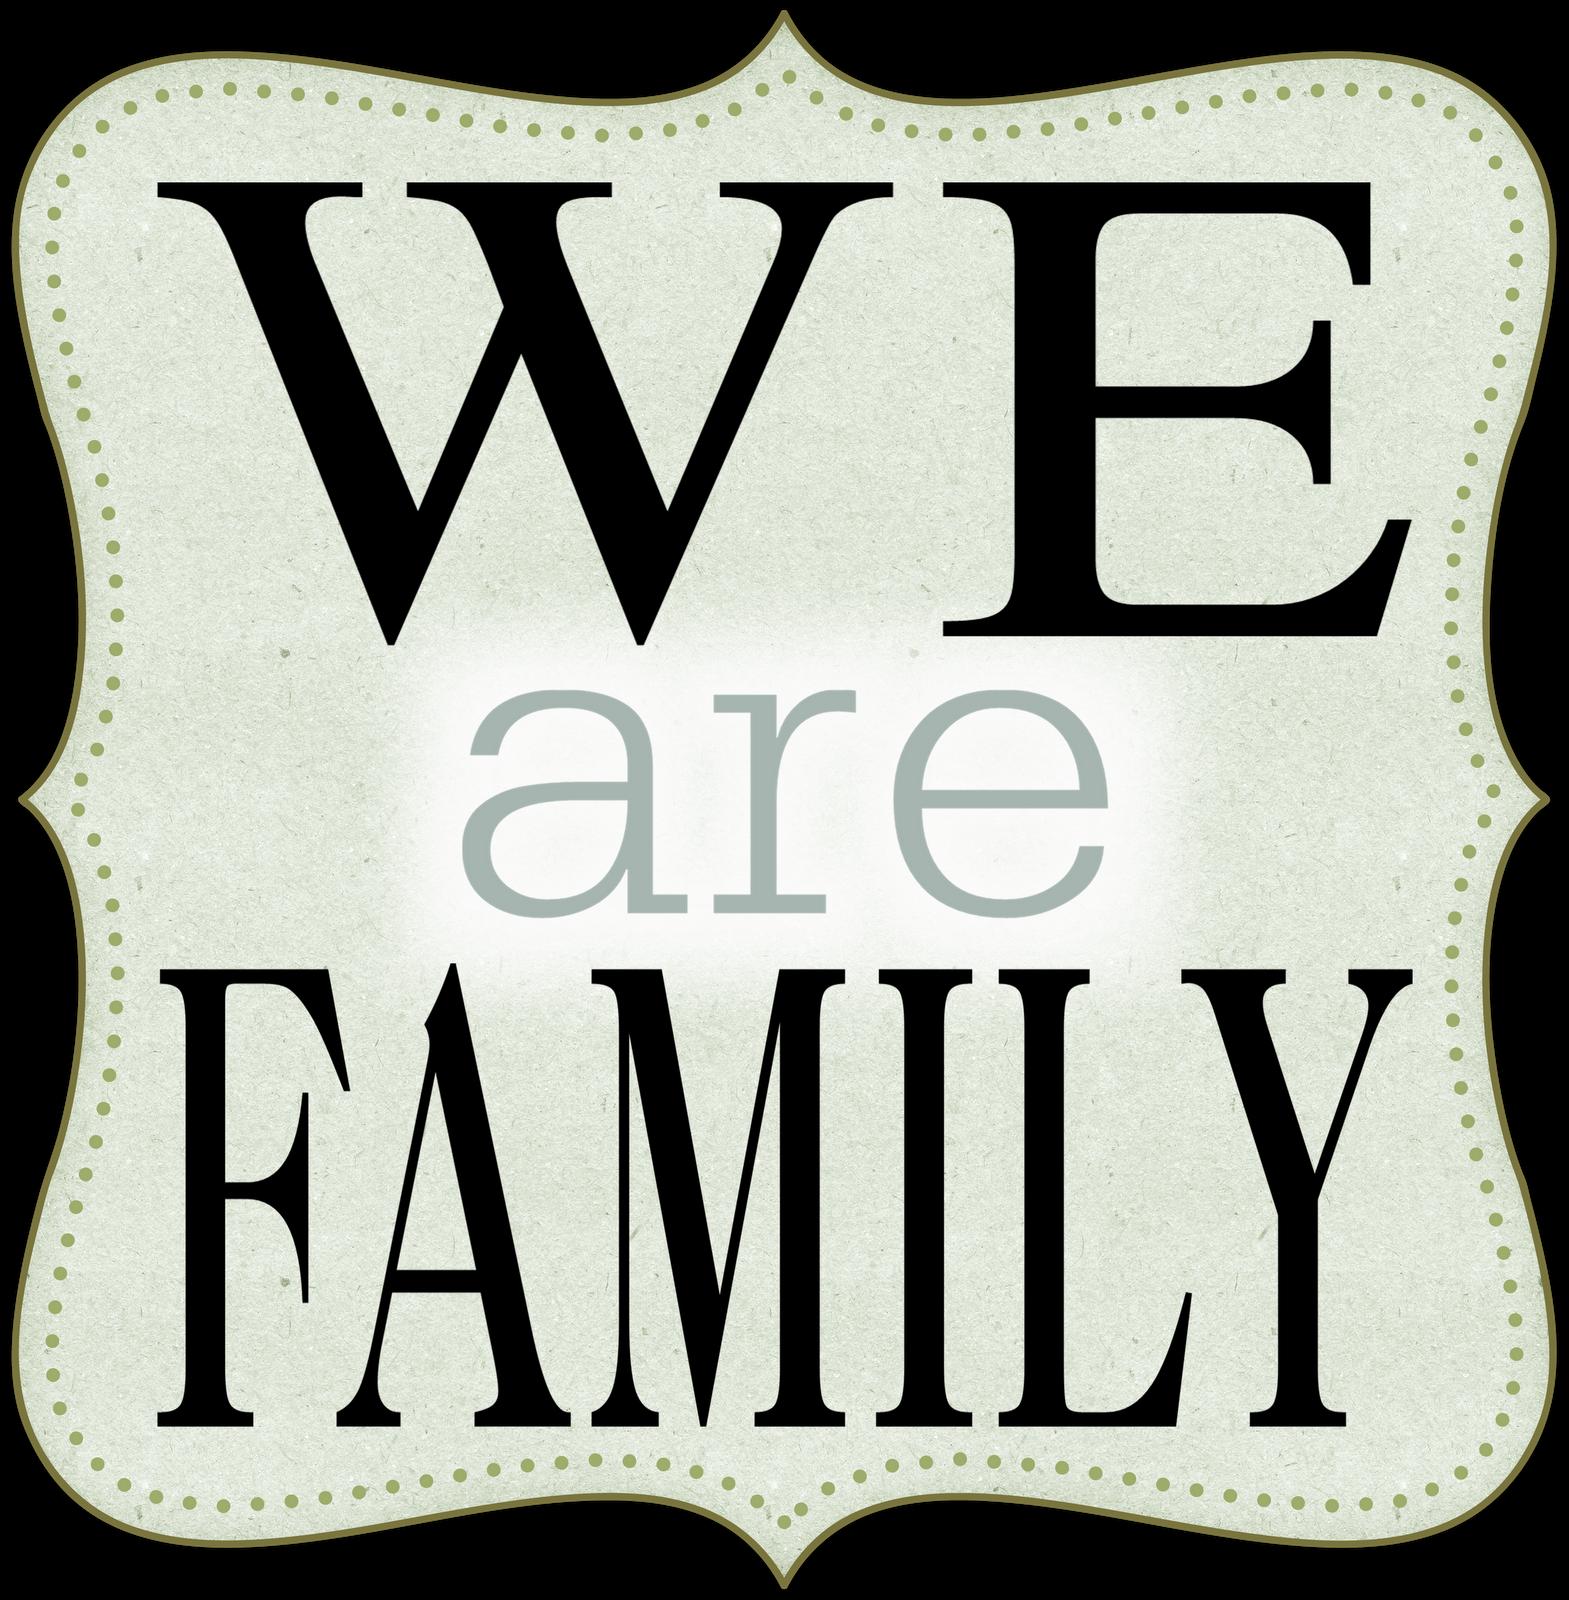 METALandMIRRORS we are family.